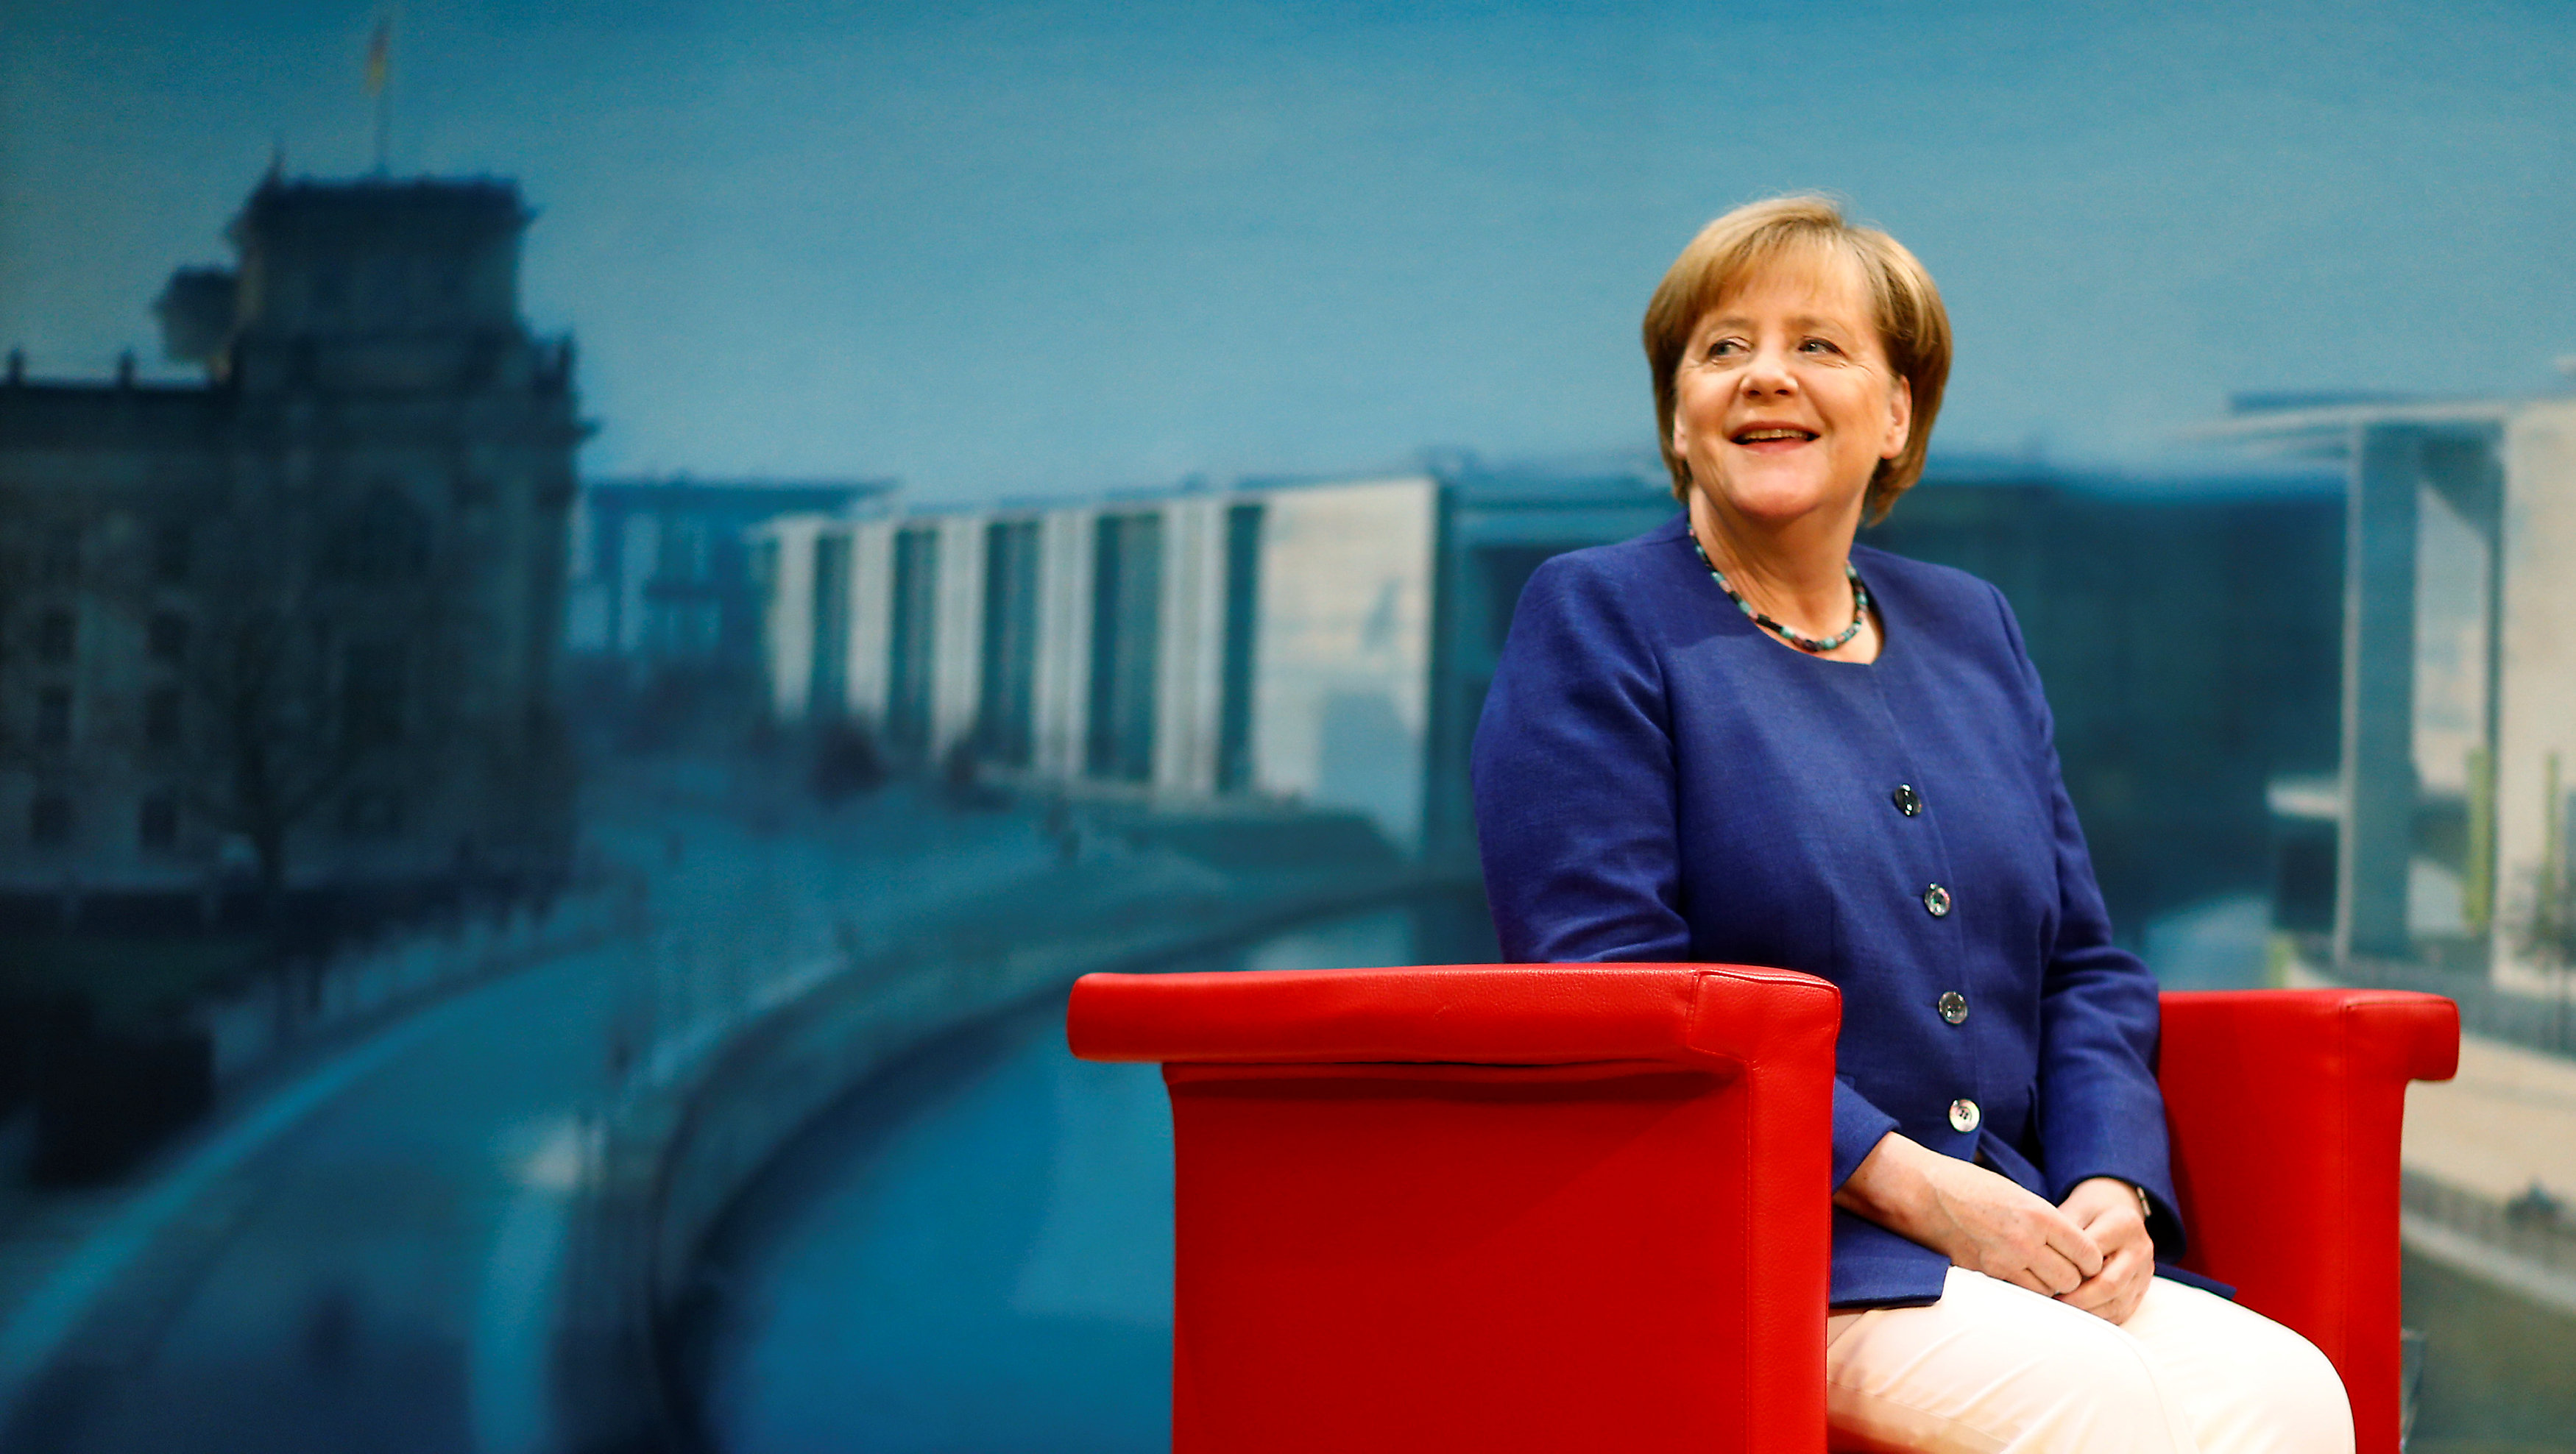 2017 07 16T153201Z 824480282 RC18944E1A20 RTRMADP 3 GERMANY ELECTION MERKEL